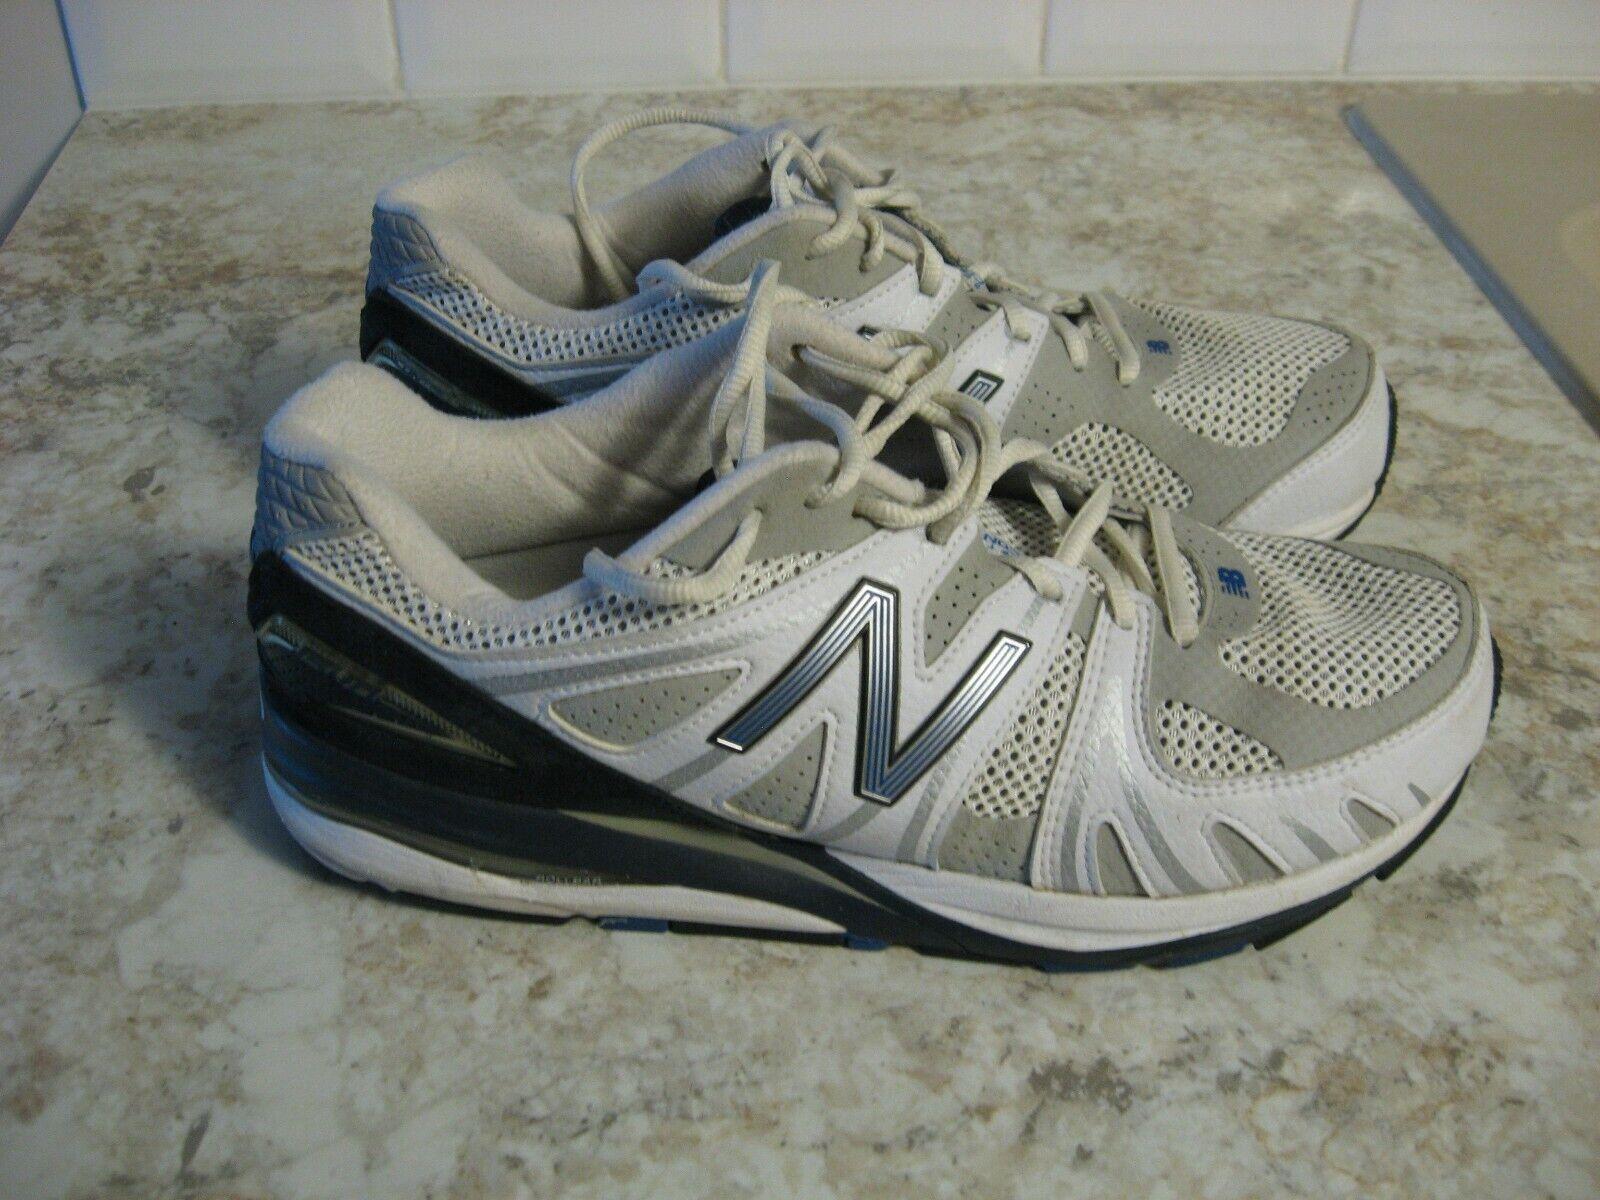 New Balance 1540 Size 10 4E Optimal Control shoes M1540WB1 bluee White